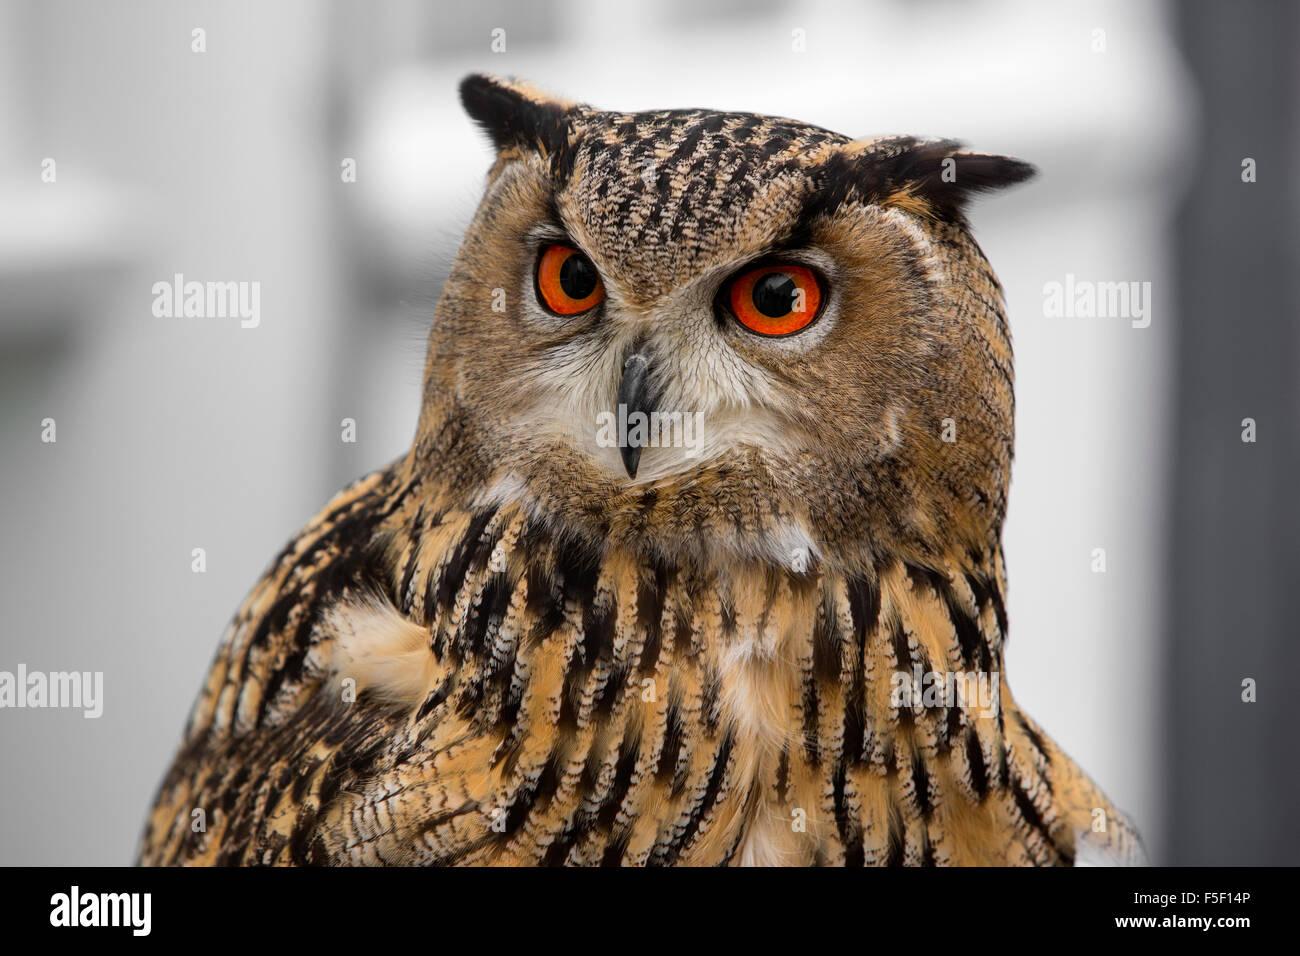 Eagle Owls - Stock Image